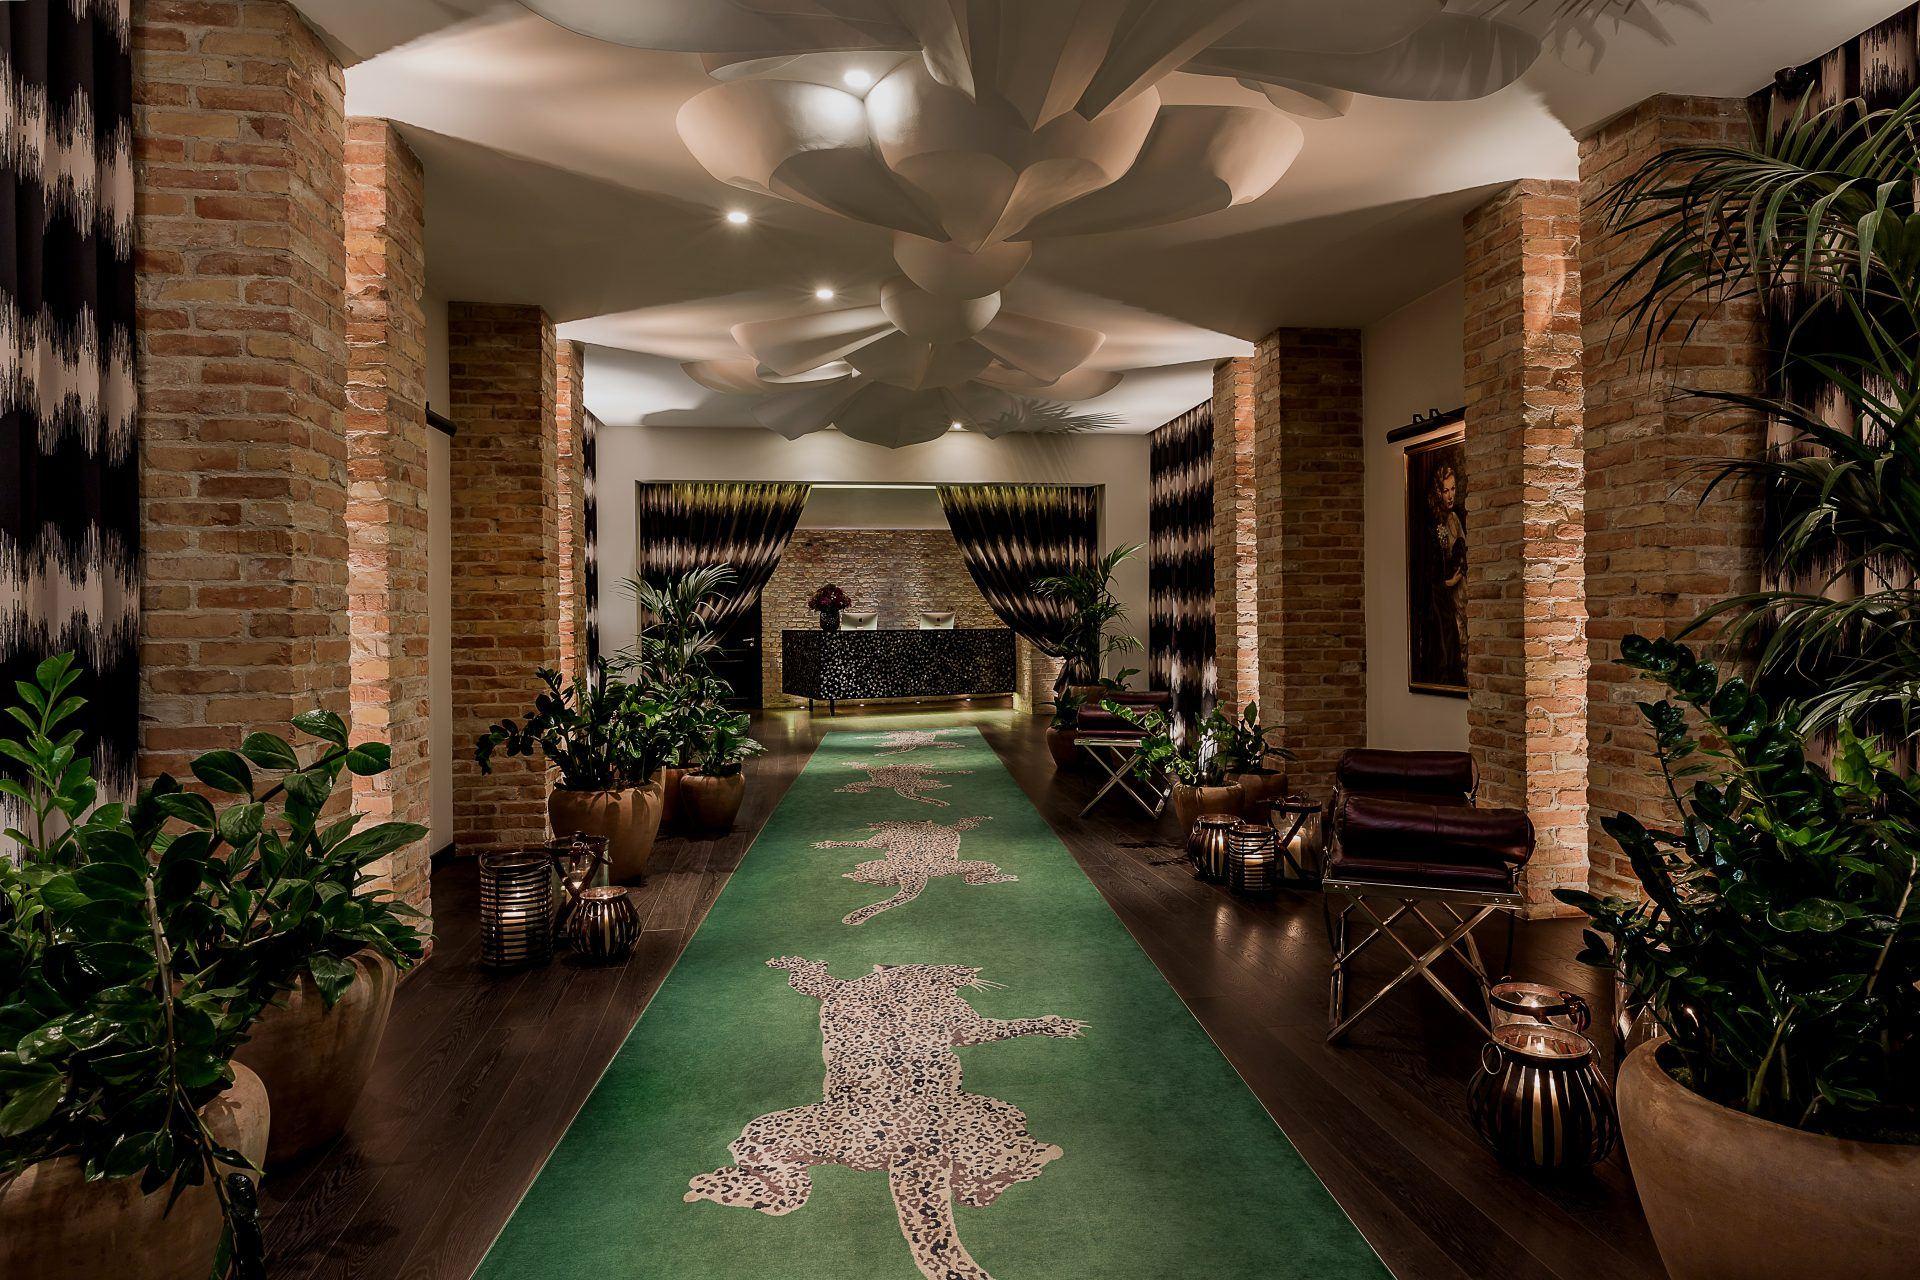 hotel zoo berlin  high res catwalk 37537024924 o 1920x1280 - HOTEL ZOO BERLIN, Berlin